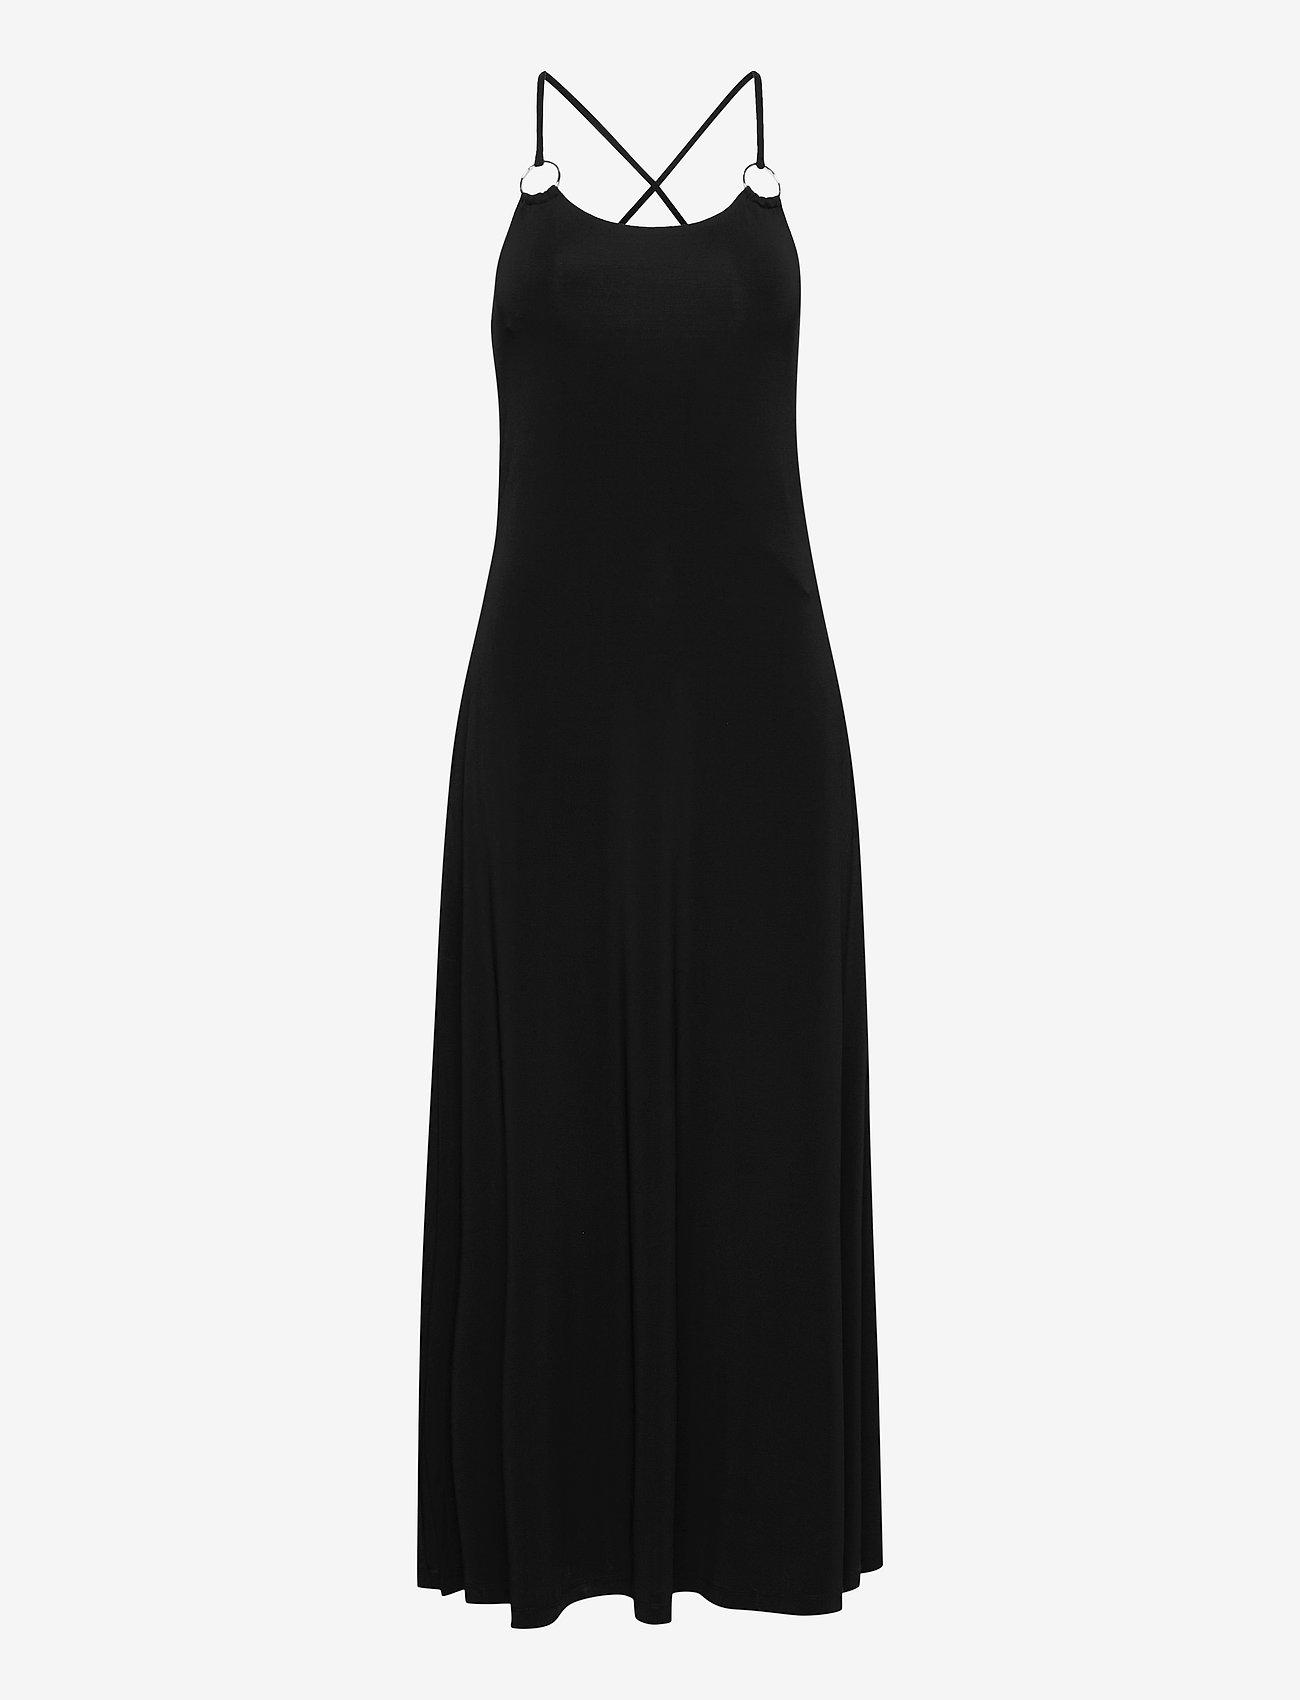 Max Mara Leisure - CREMONA - beachwear - black - 0